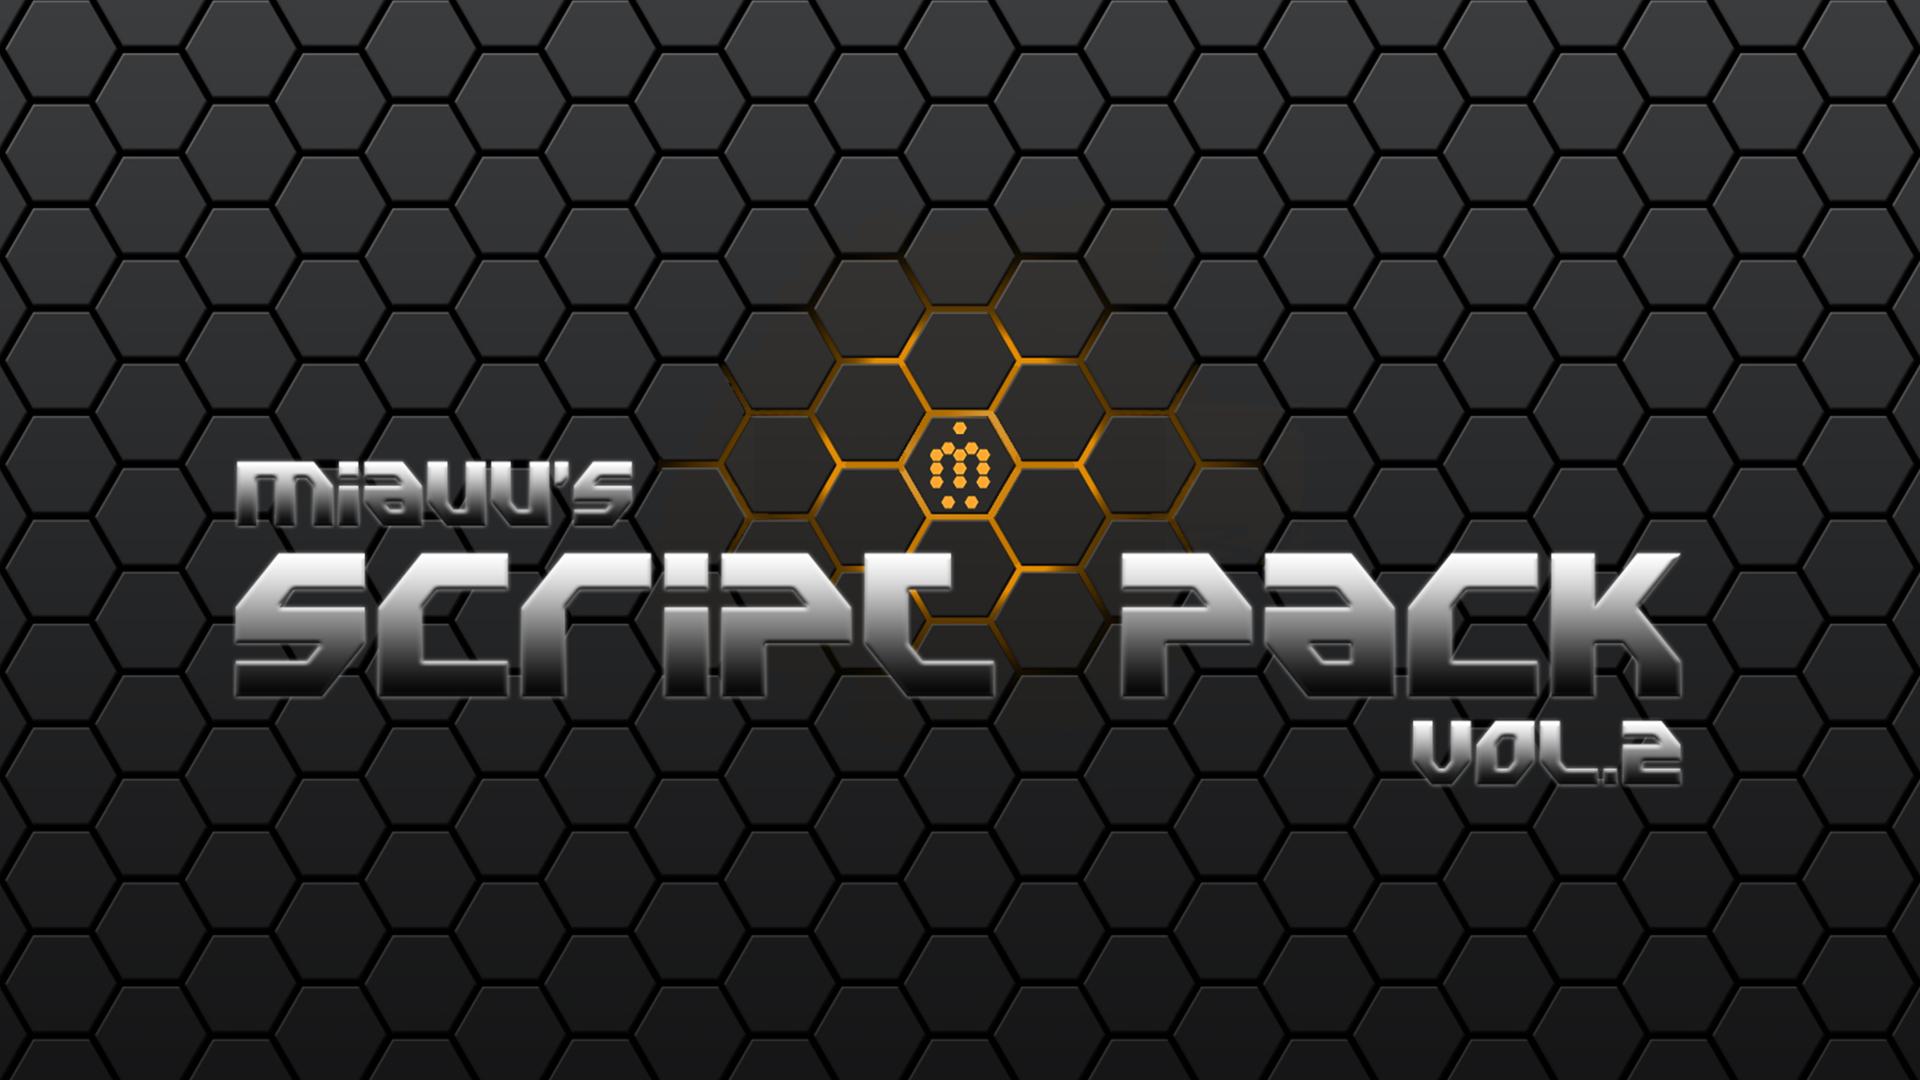 miauu's Script Pack vol 2 - miauu's Scripts & Tools for 3ds Max